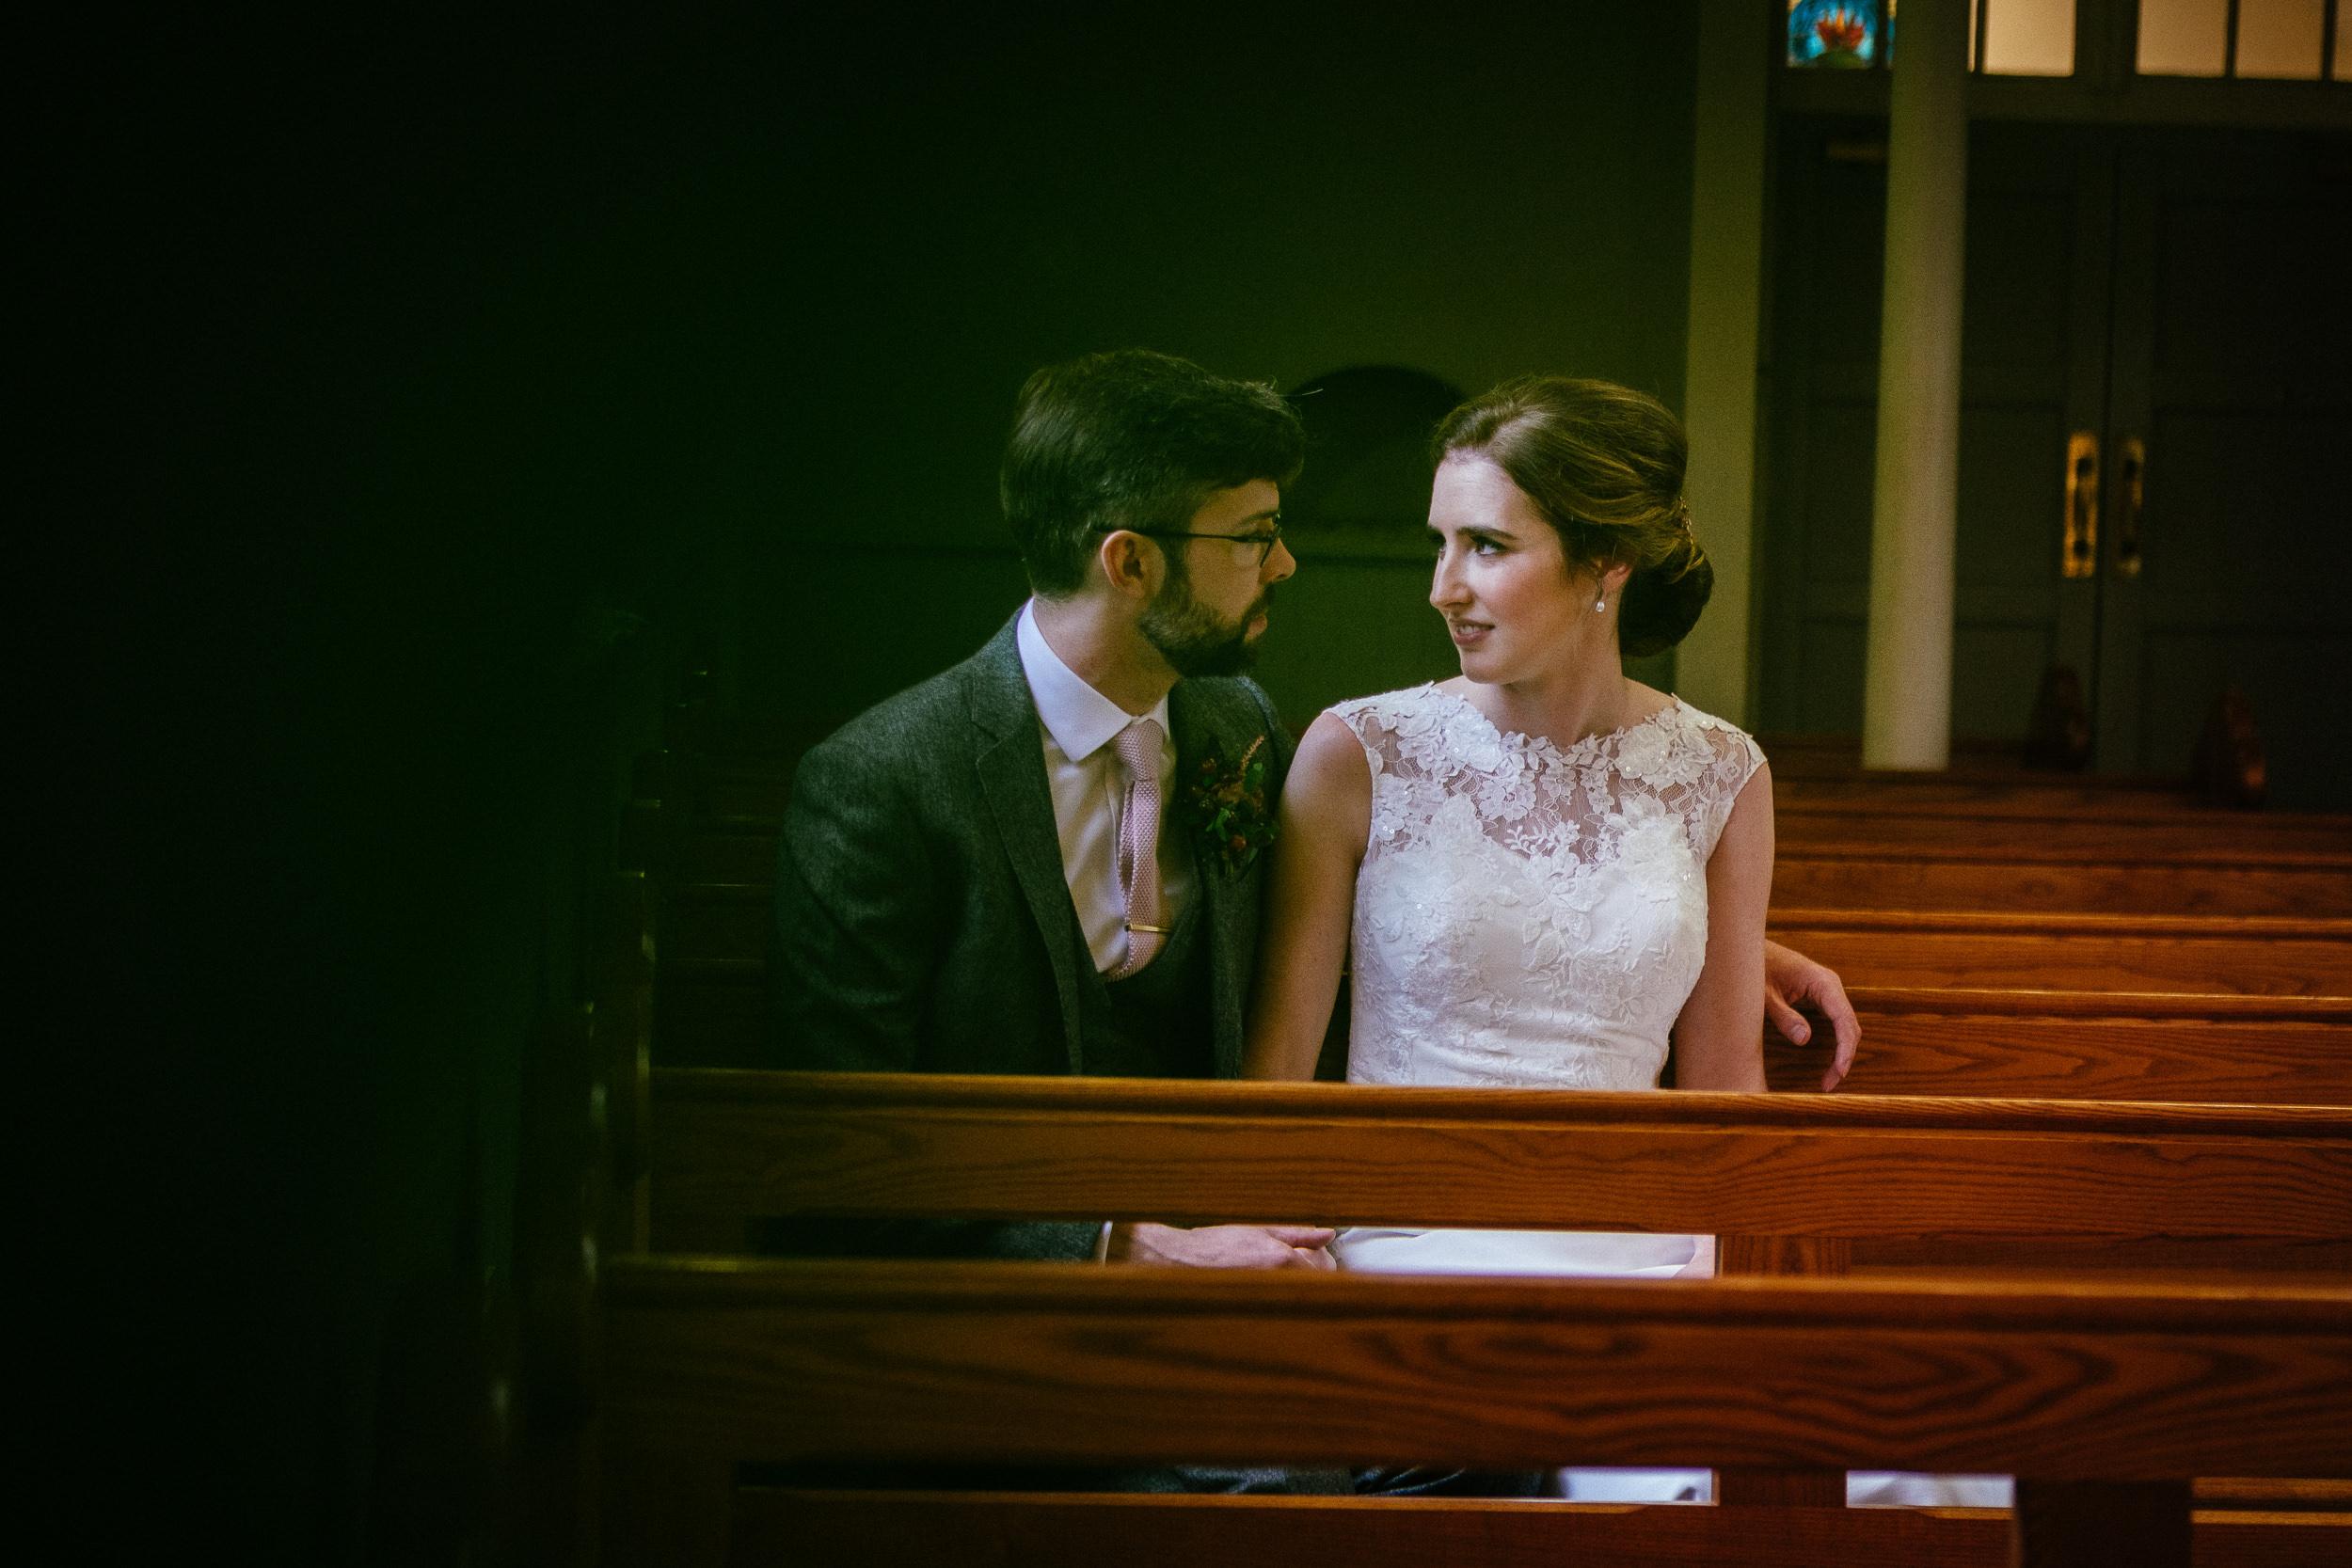 tinakilly house Wedding Photographer053